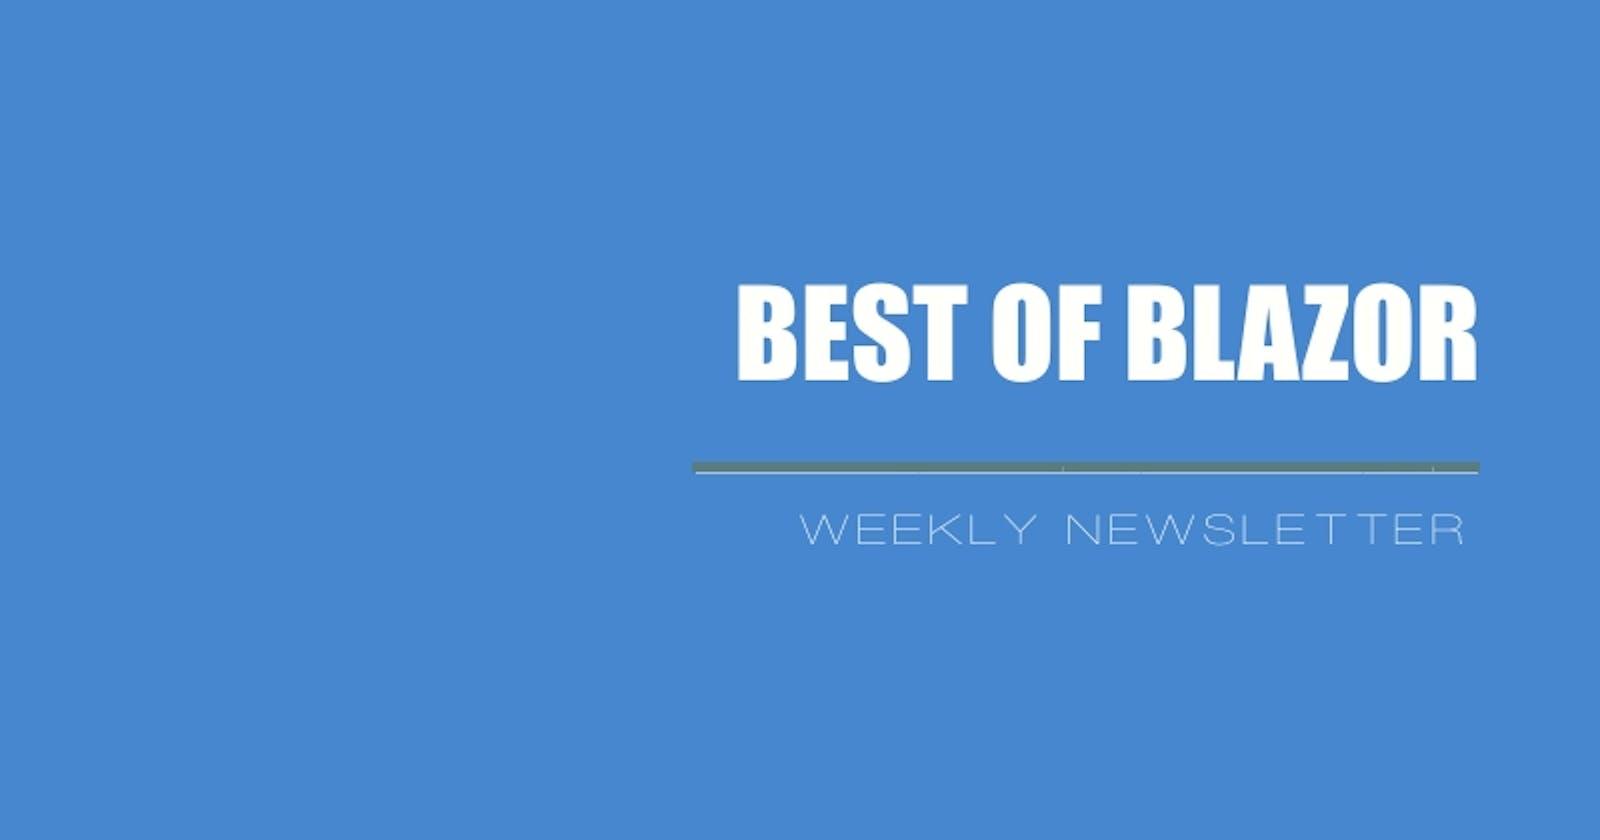 Blazor Weekly Newsletter #25